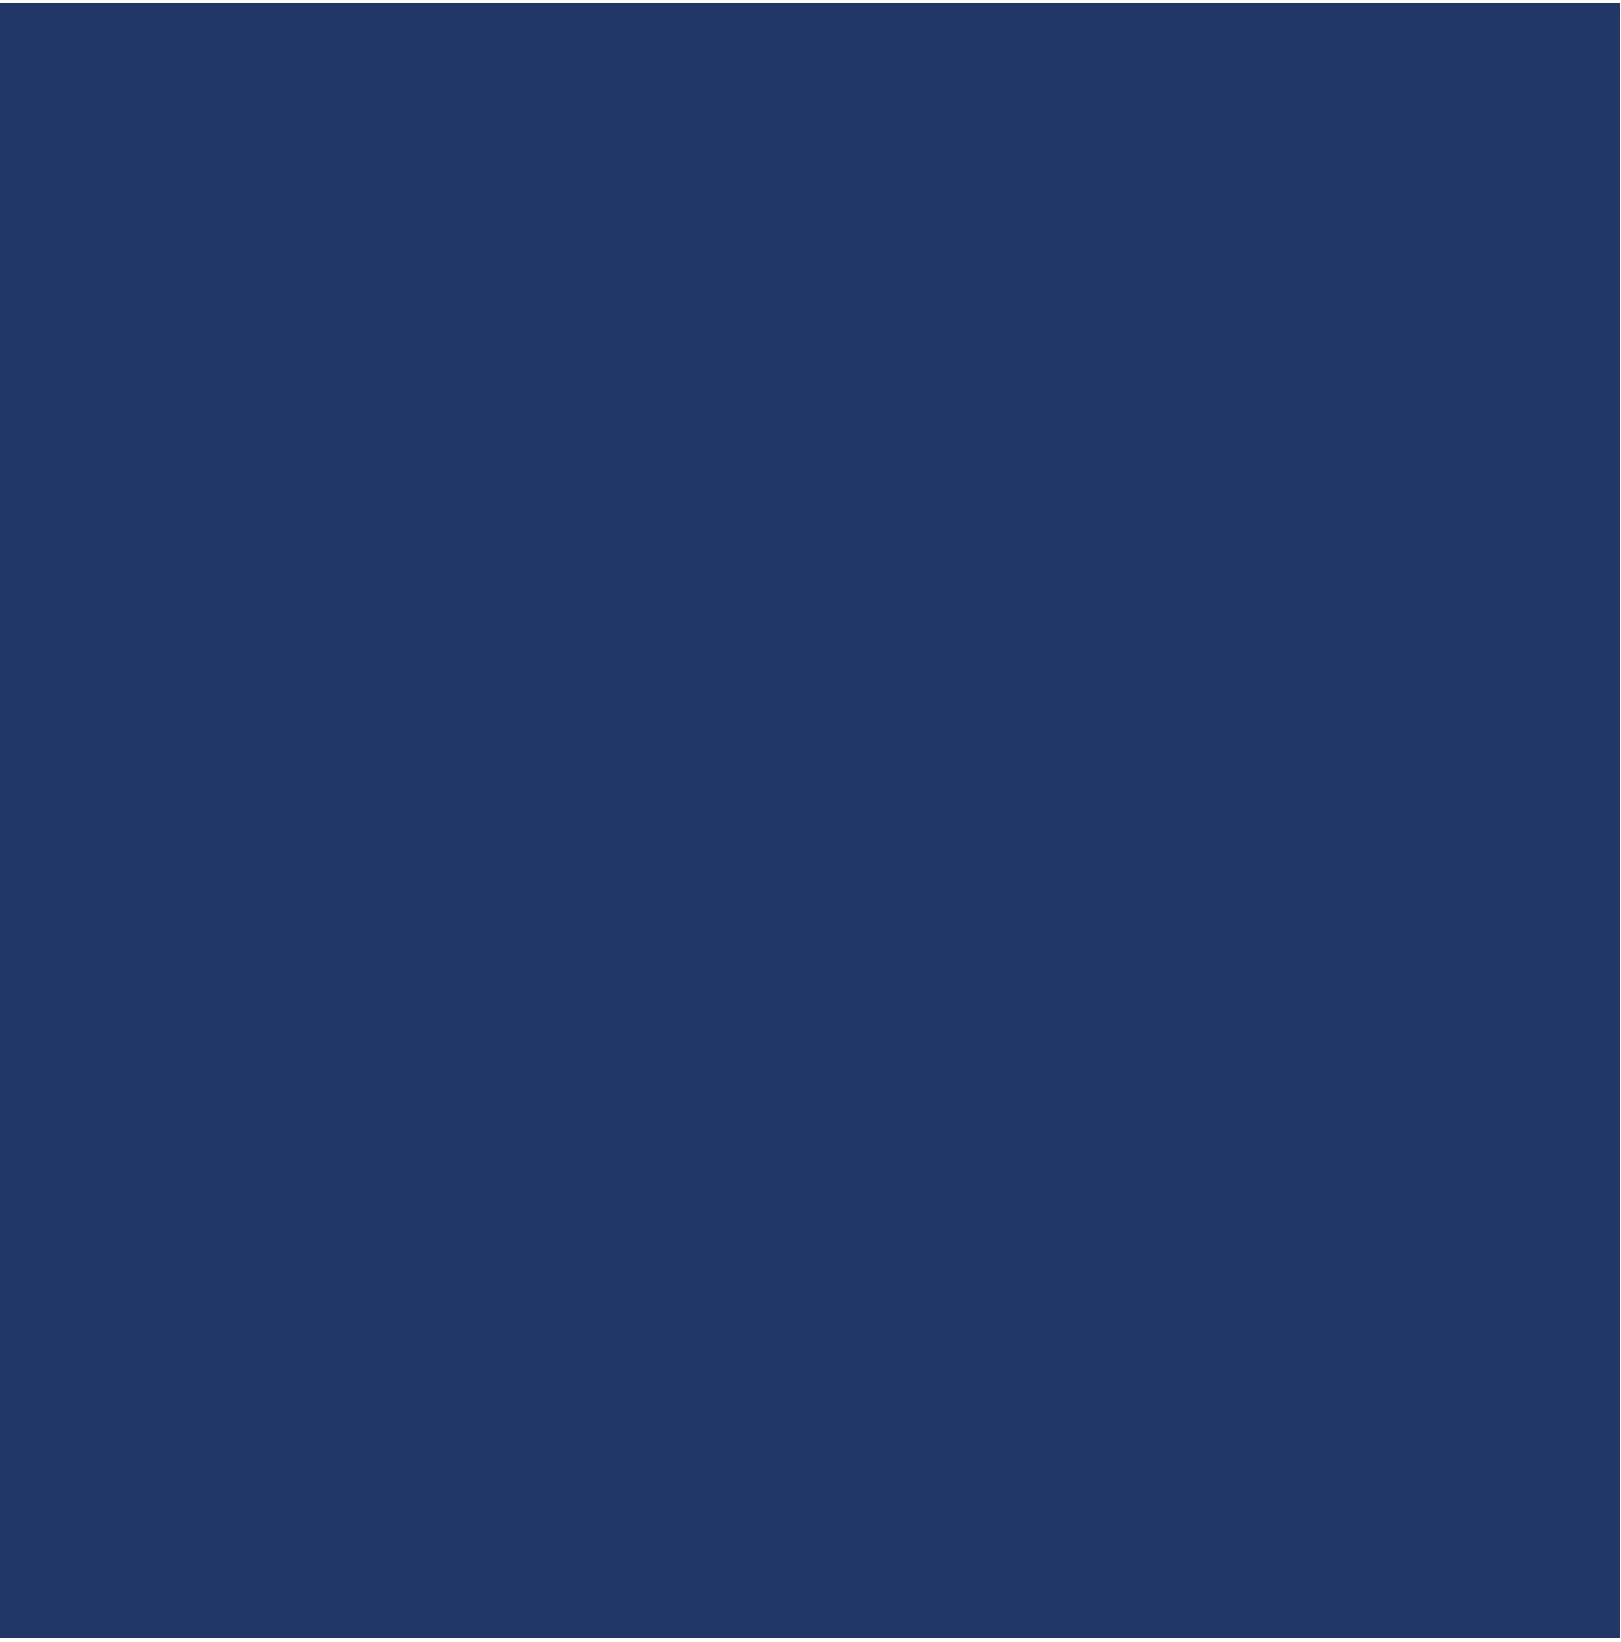 Internetrecht Mönchengladbach